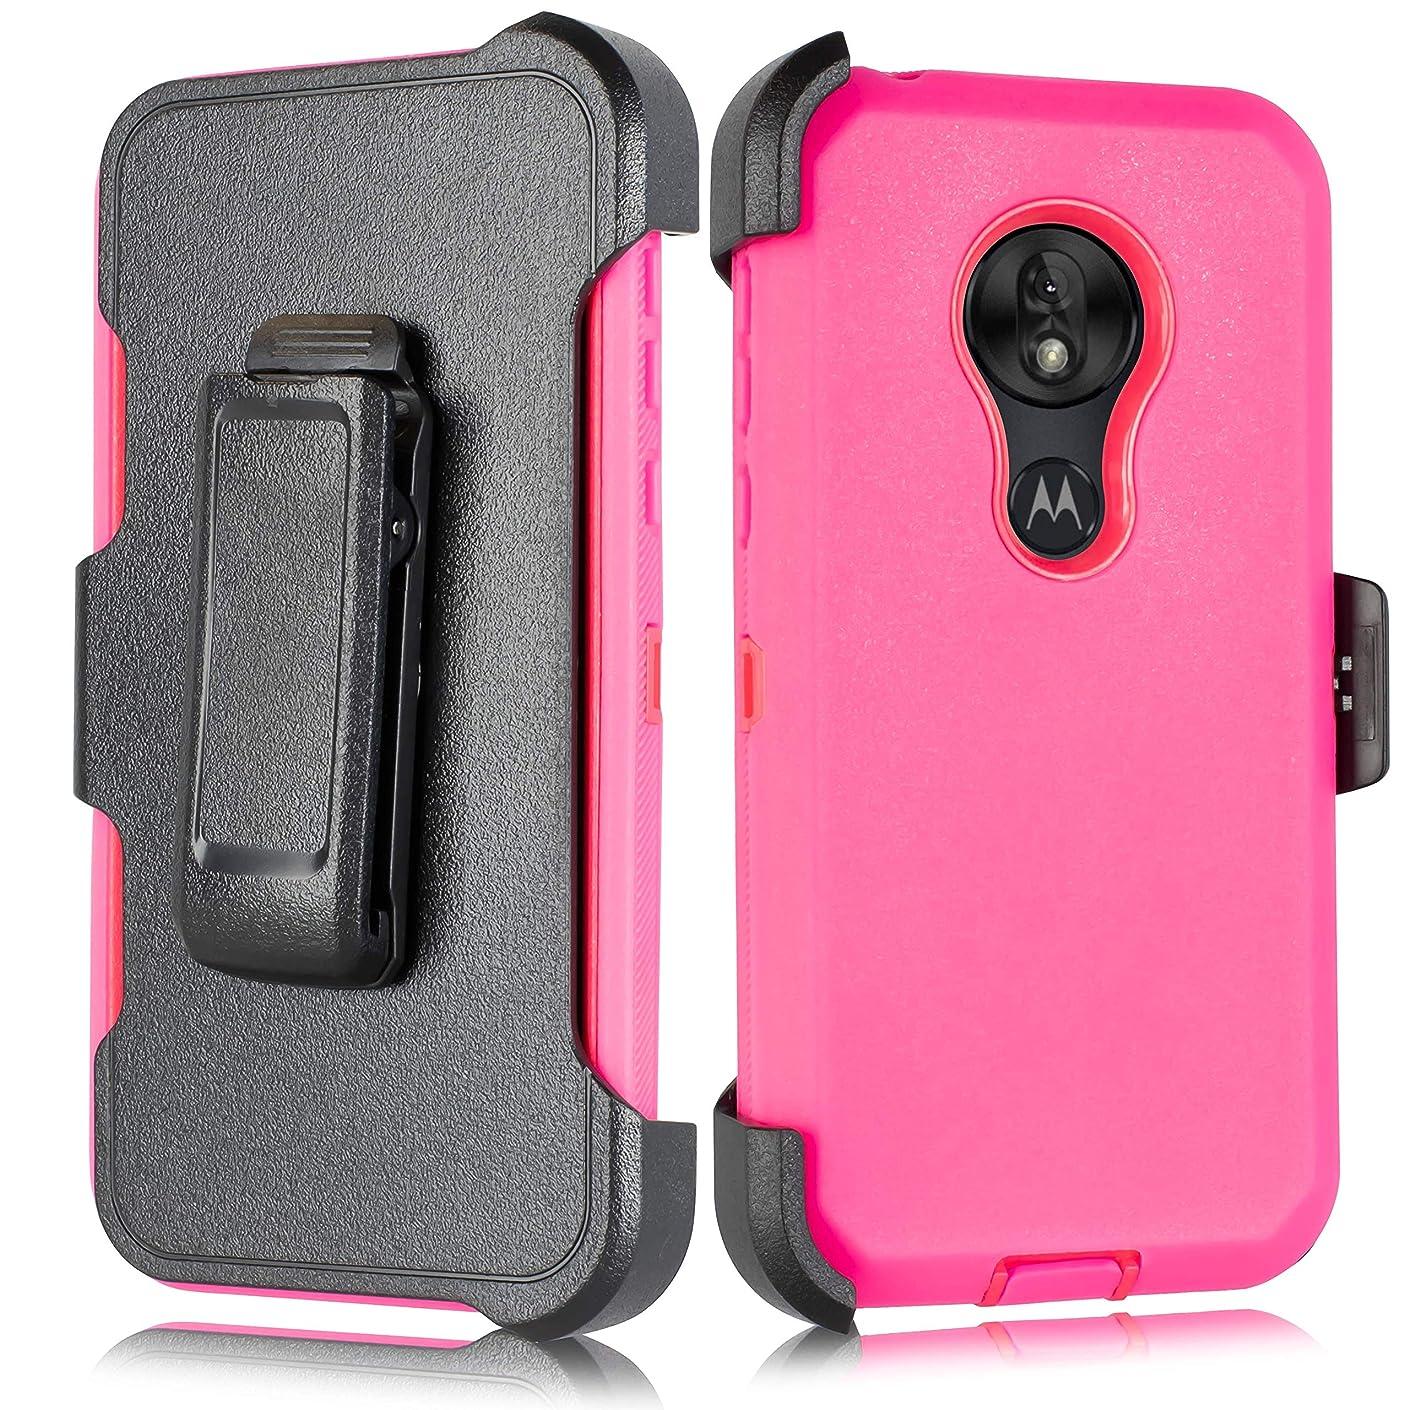 for Moto G7 / Moto G7 Plus case (2019)【Built-in Kickstand & Belt Clip Holster】[Built in Screen Protector] Anti-Slip Grip [Shockproof Bumper] for Motorola G7, Motorola G7 Plus (Pink)